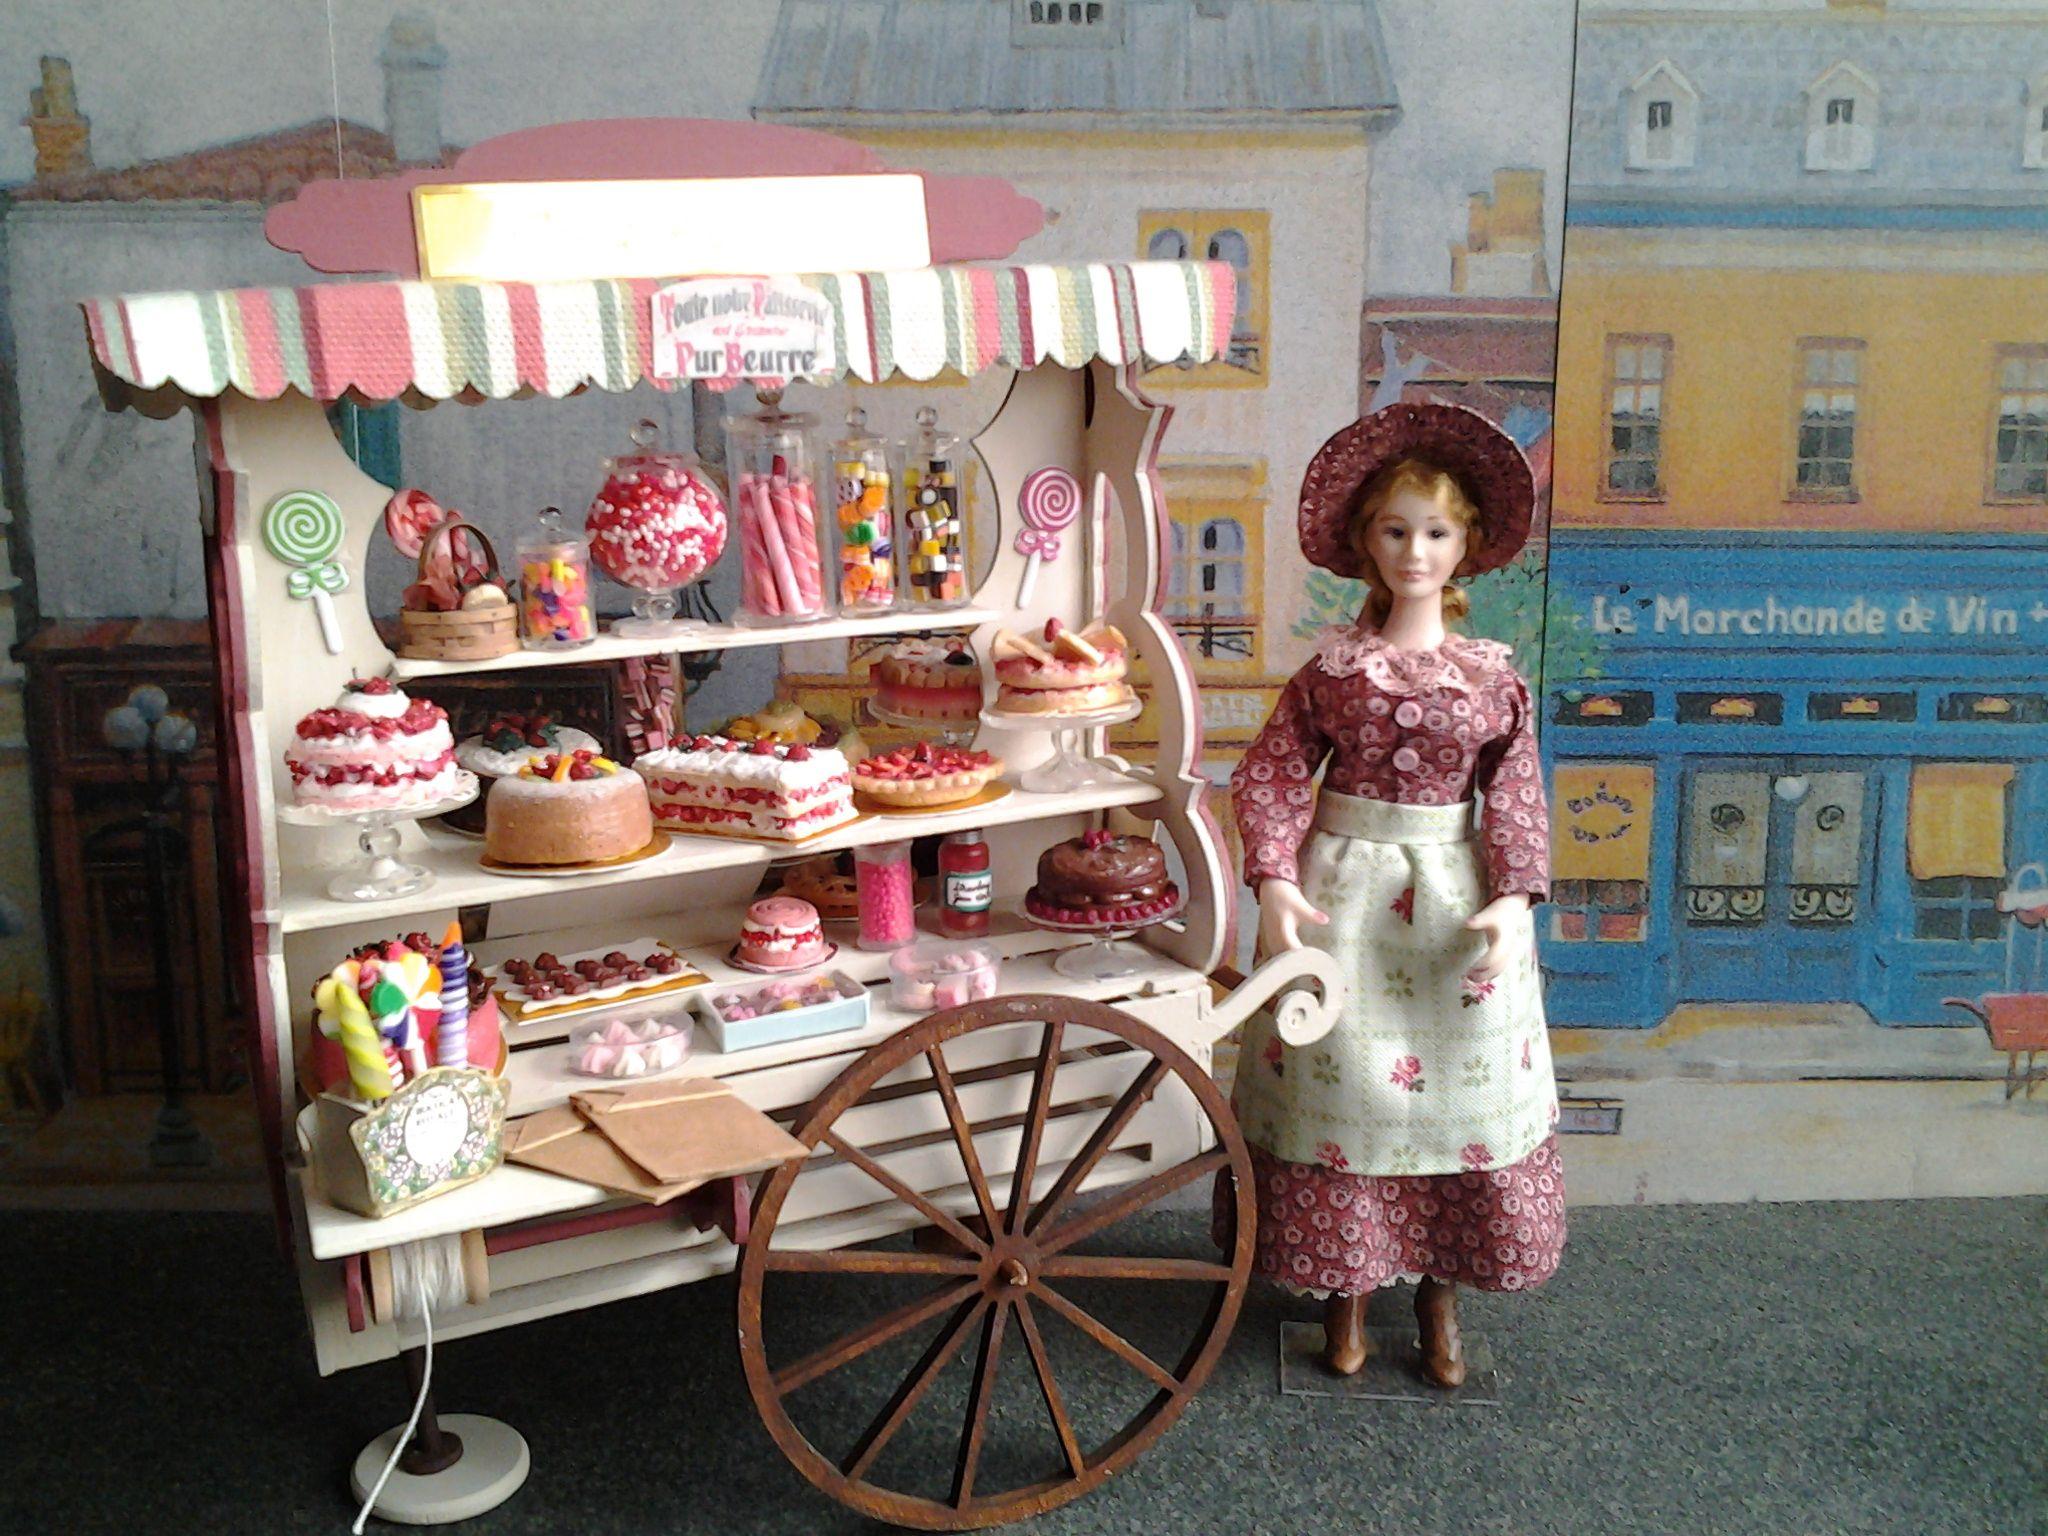 carrito de pasteles/pastry stall